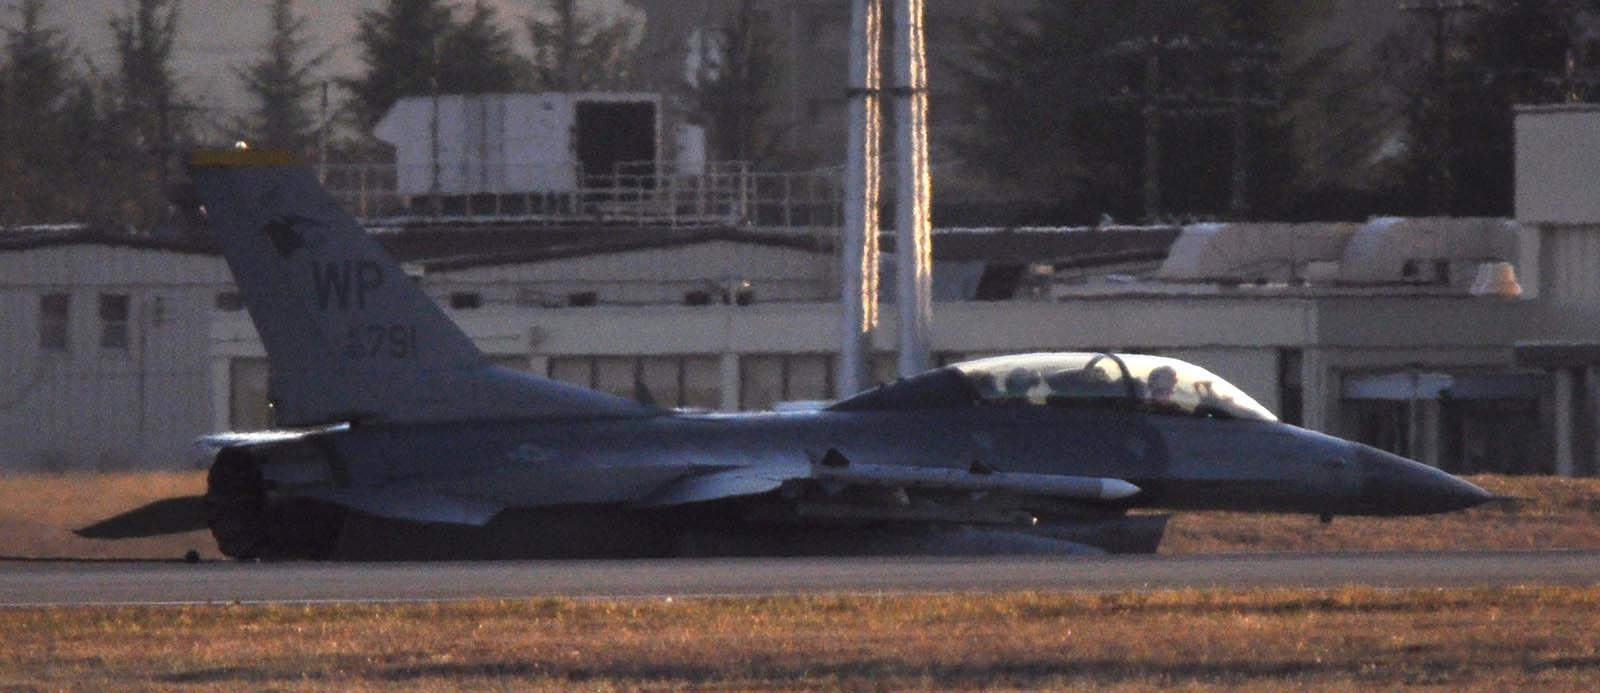 F16dg111217g156